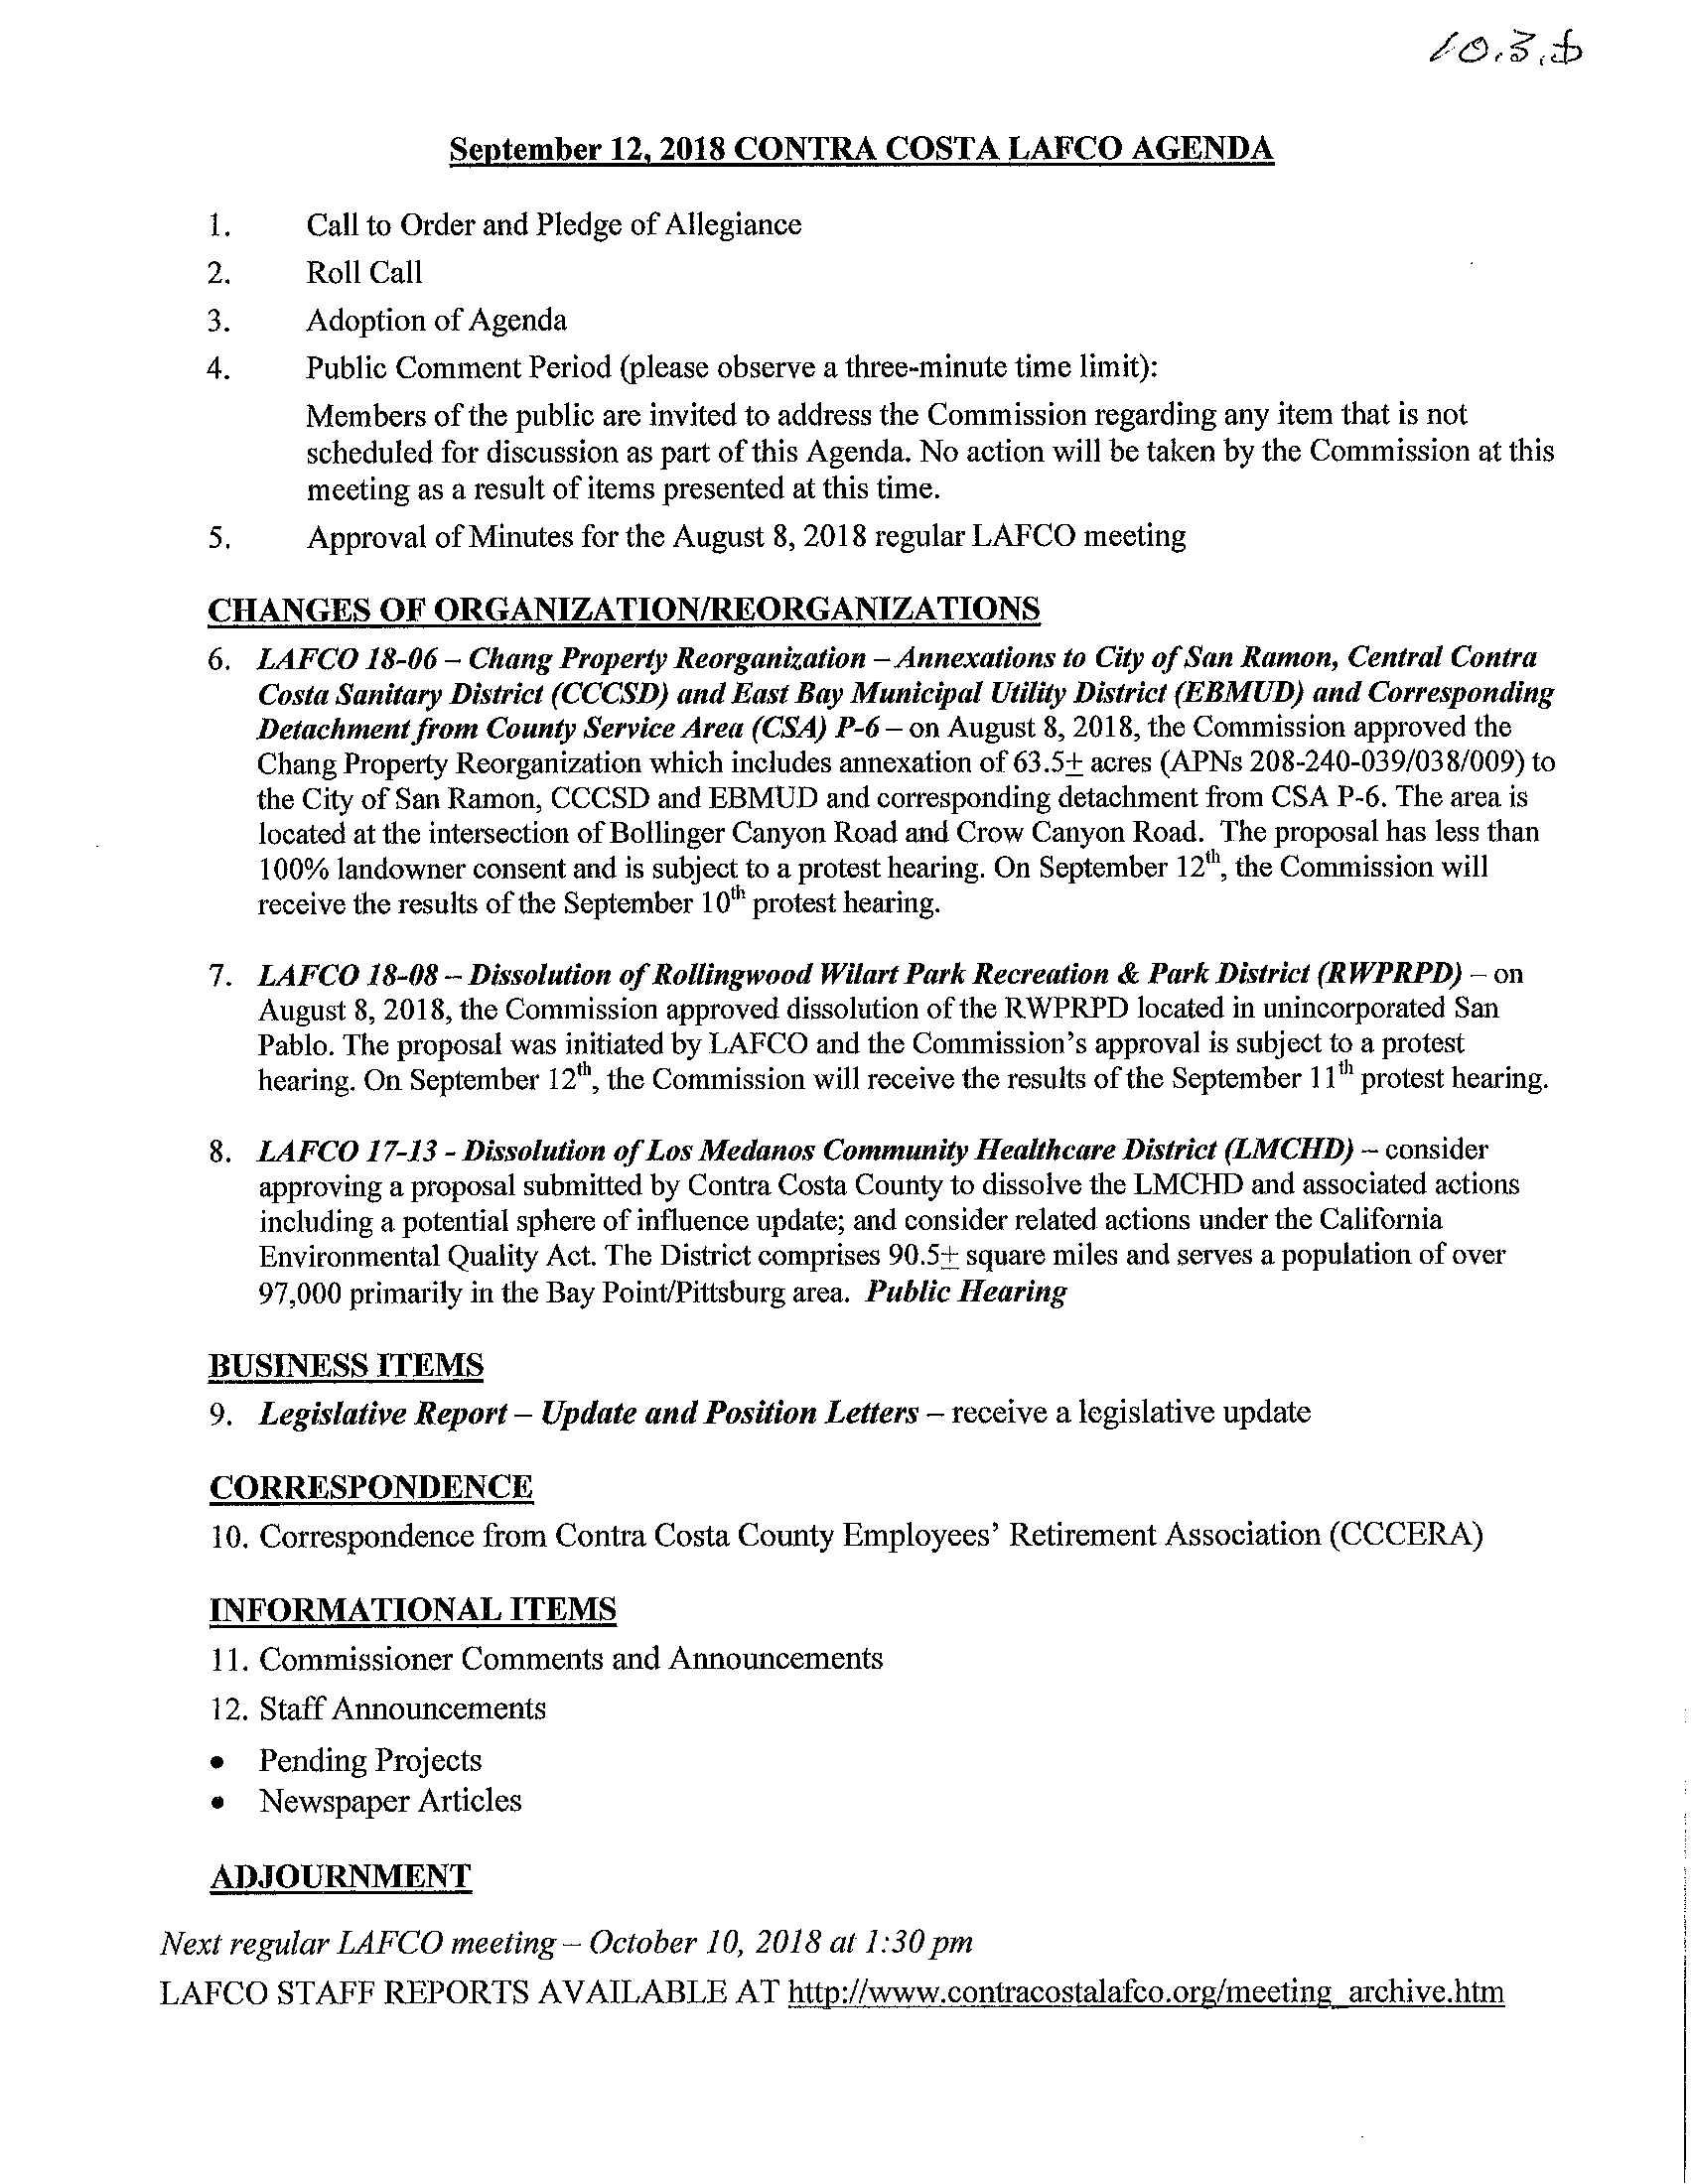 ESMAC Agenda 10.10.2018 (32 Pages)_22.jpg